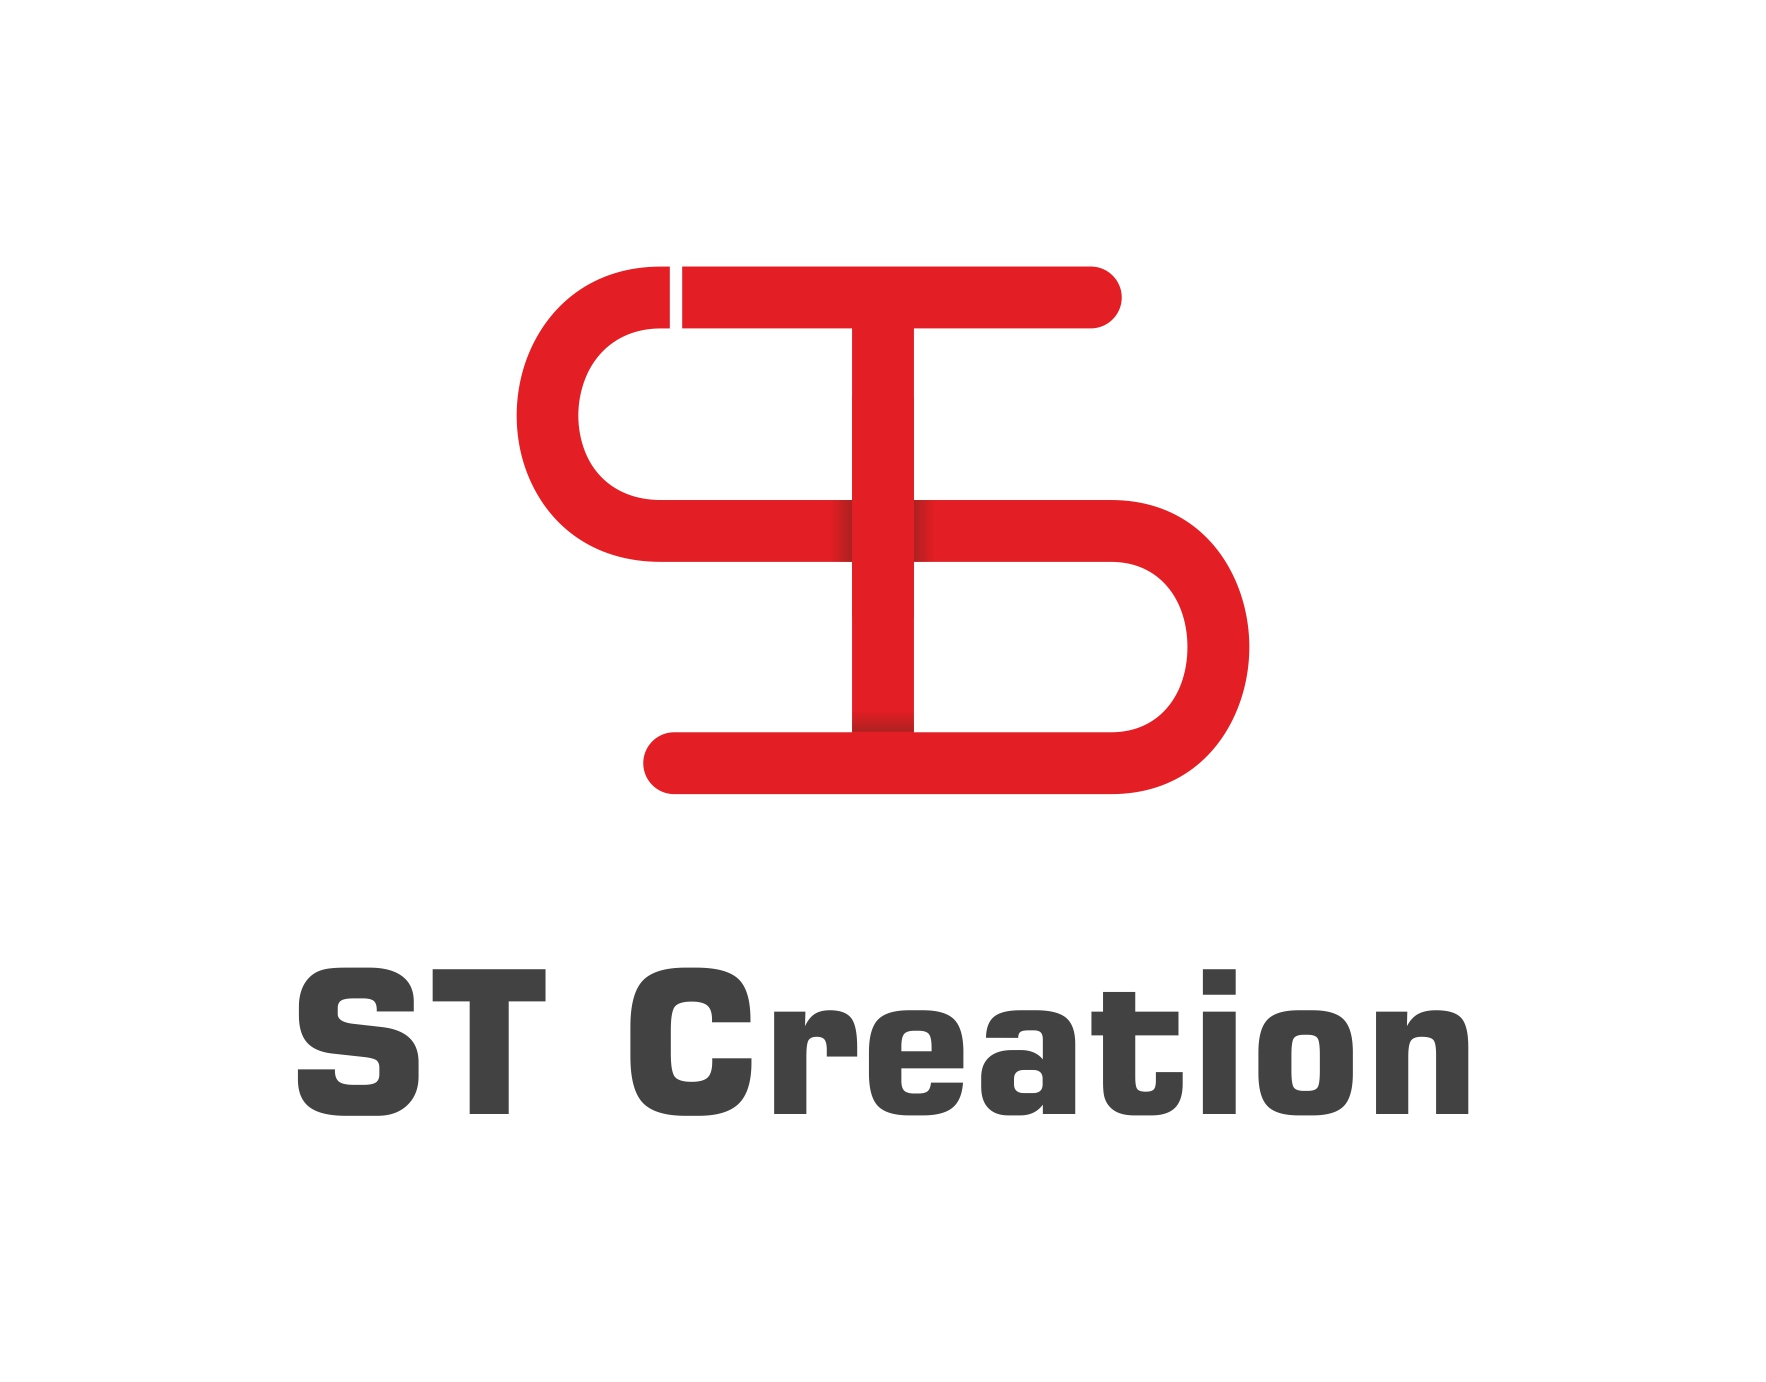 ST Creation